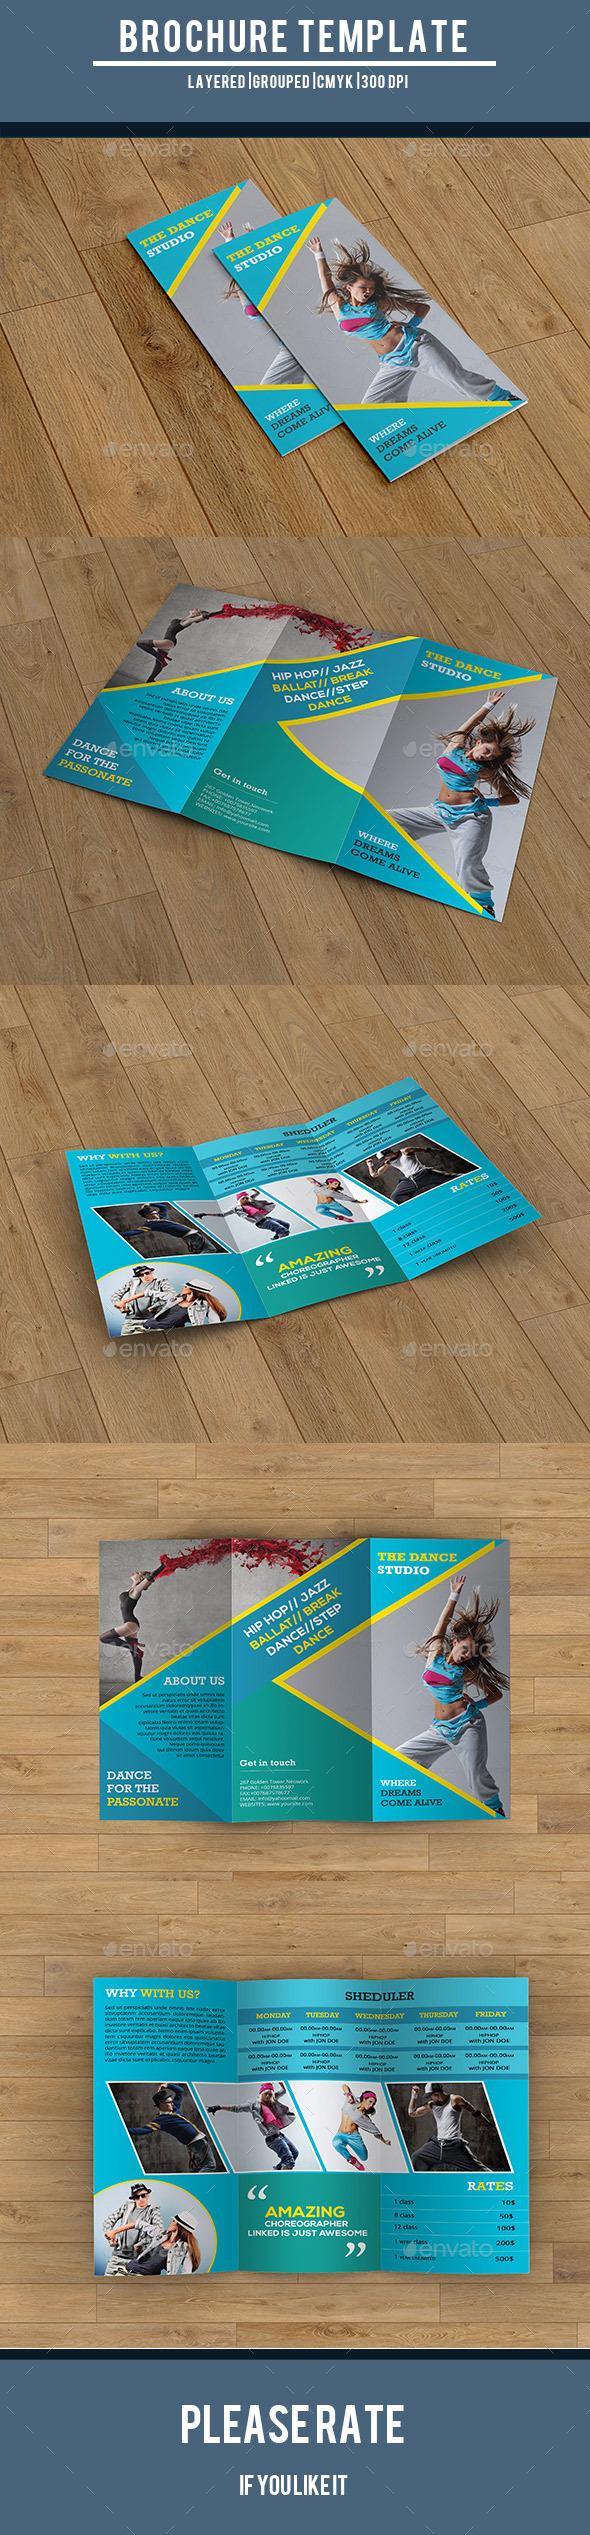 Dance Studio Trifold Brochure-V214 - Corporate Brochures